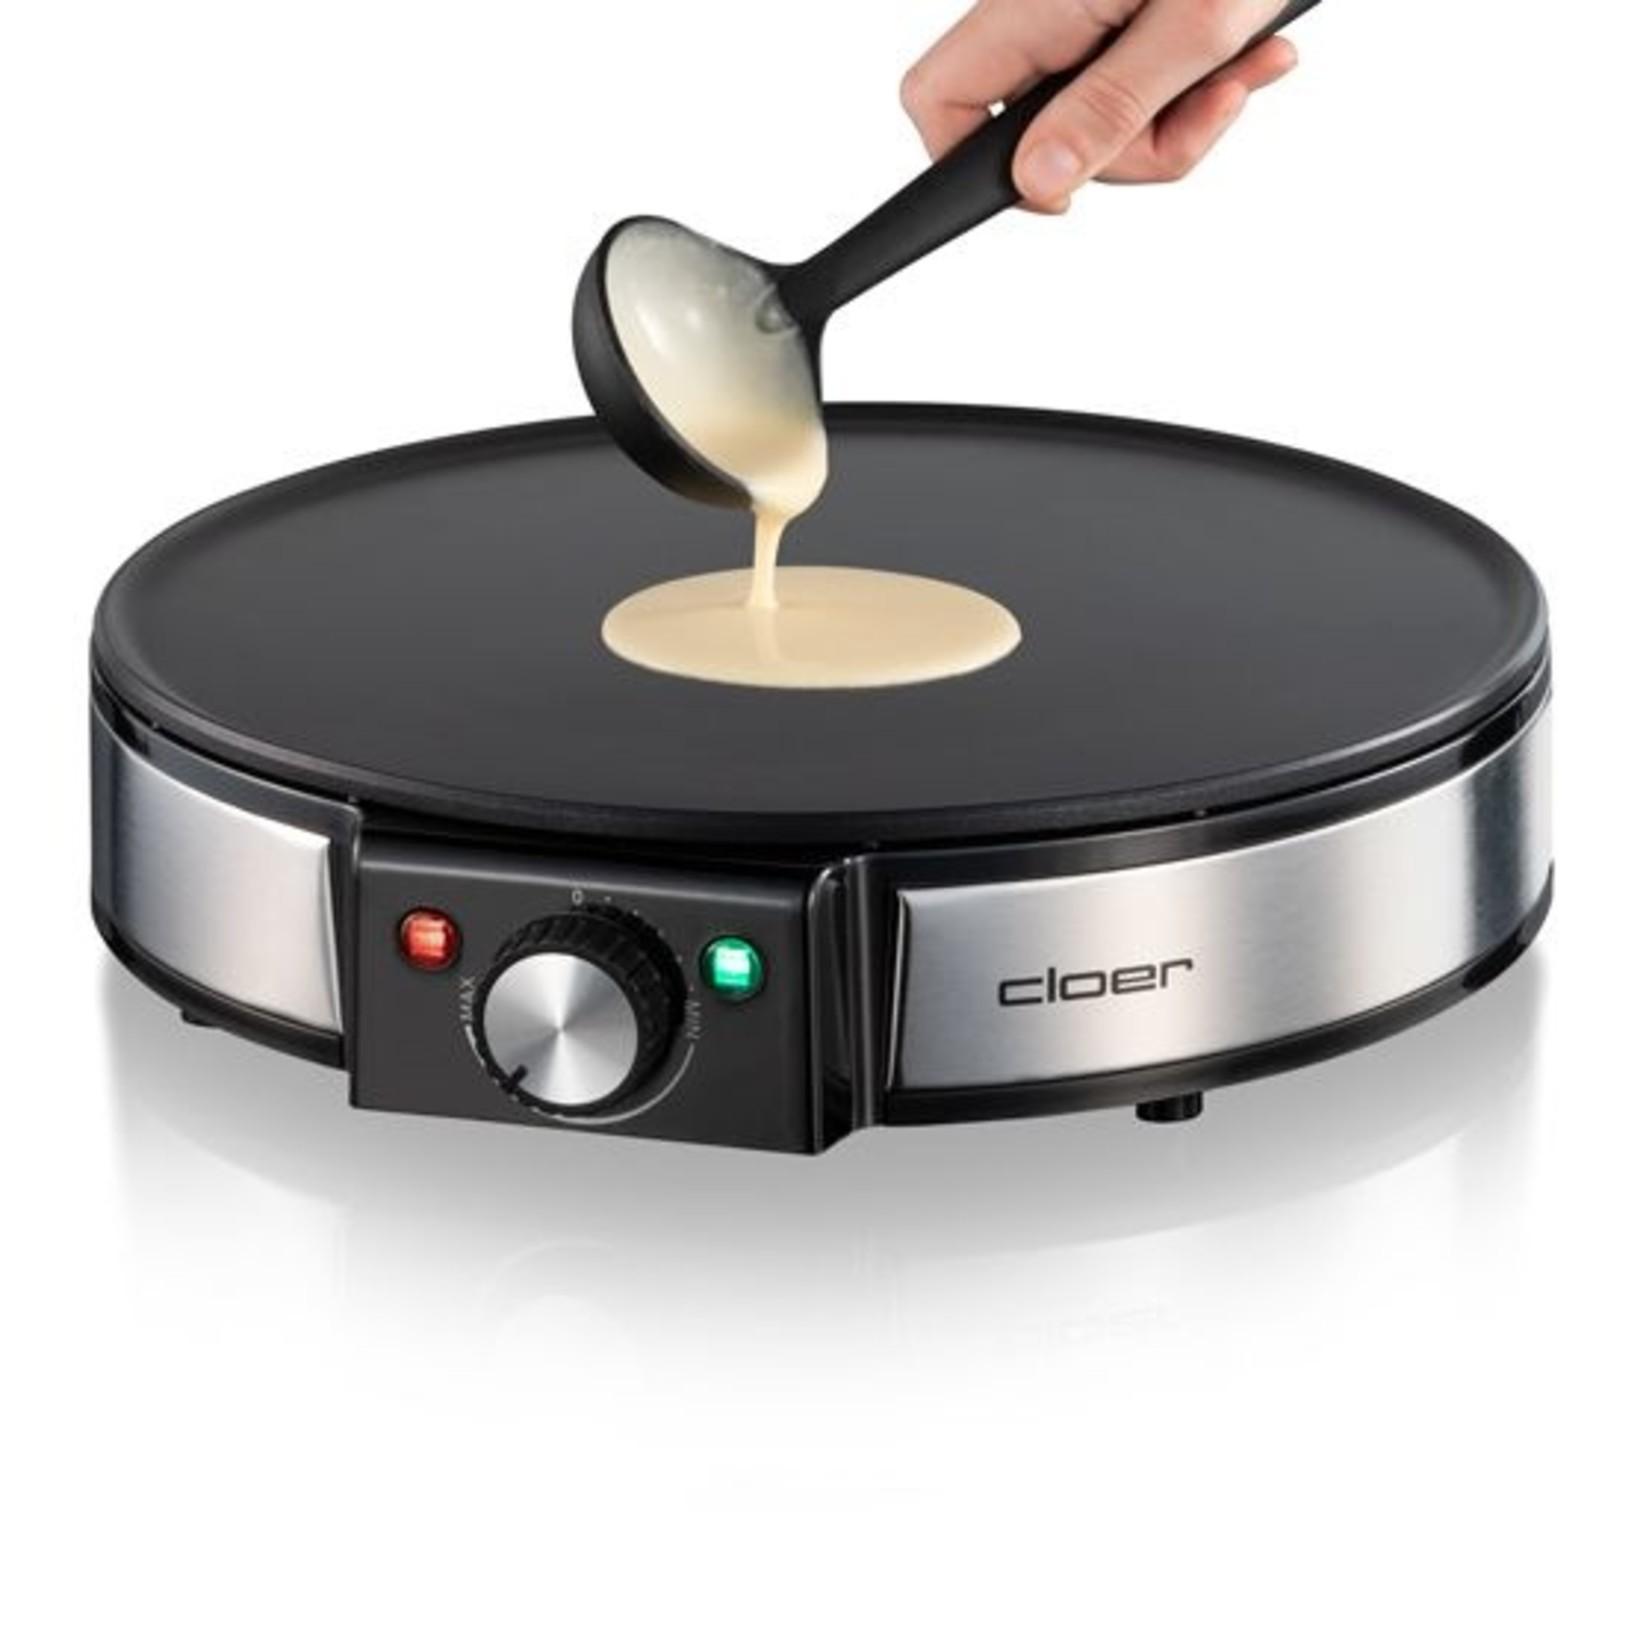 Cloer Cloer crepes maker 6630